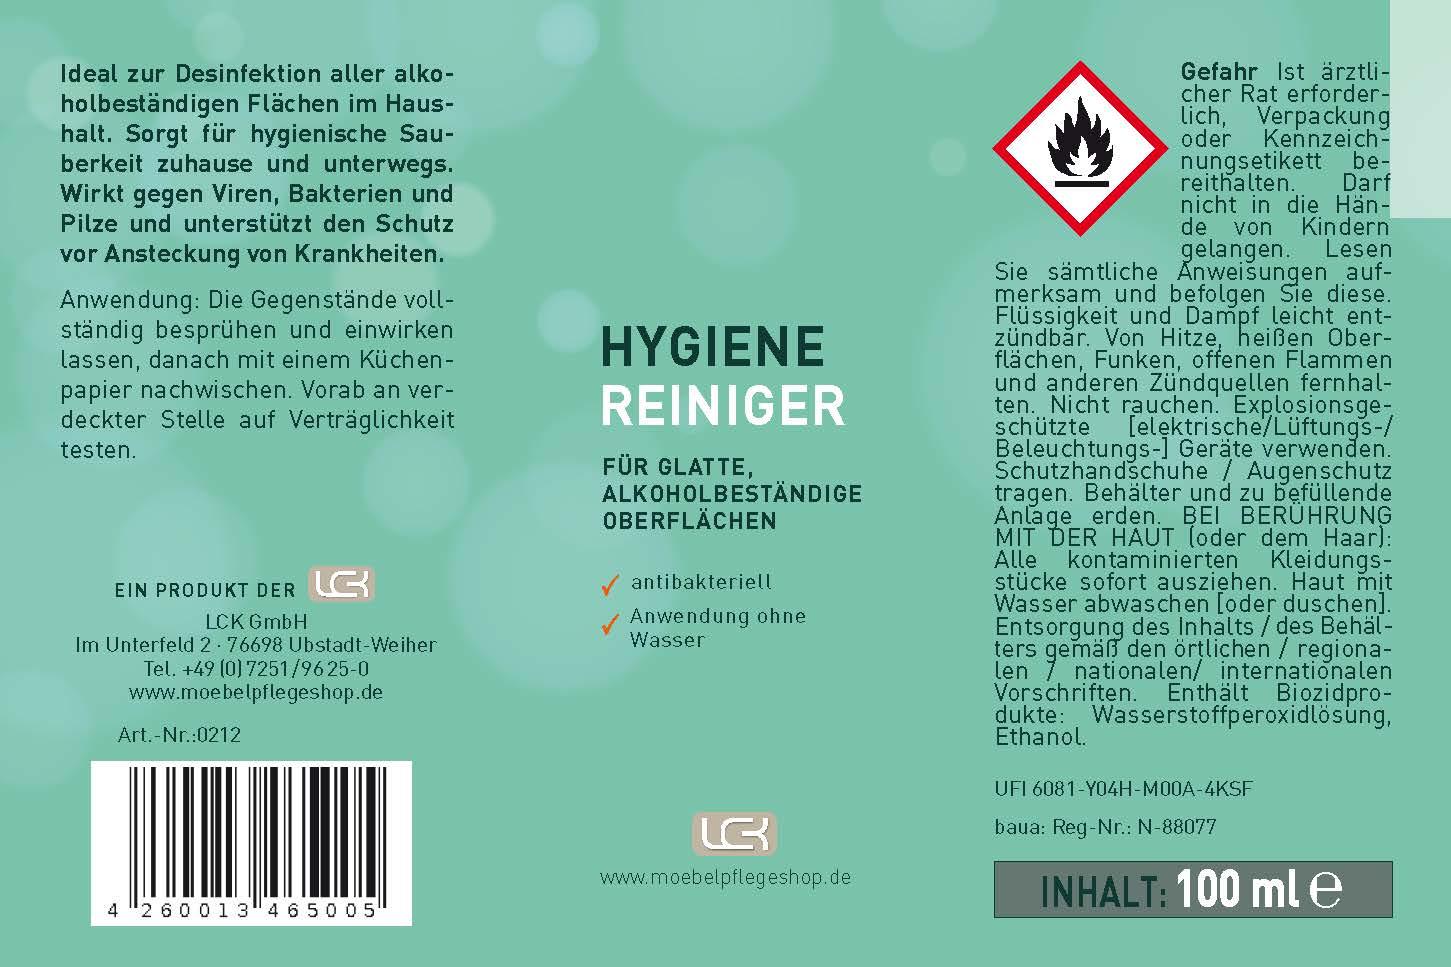 Hygiene-Reiniger > antibakteriell 2